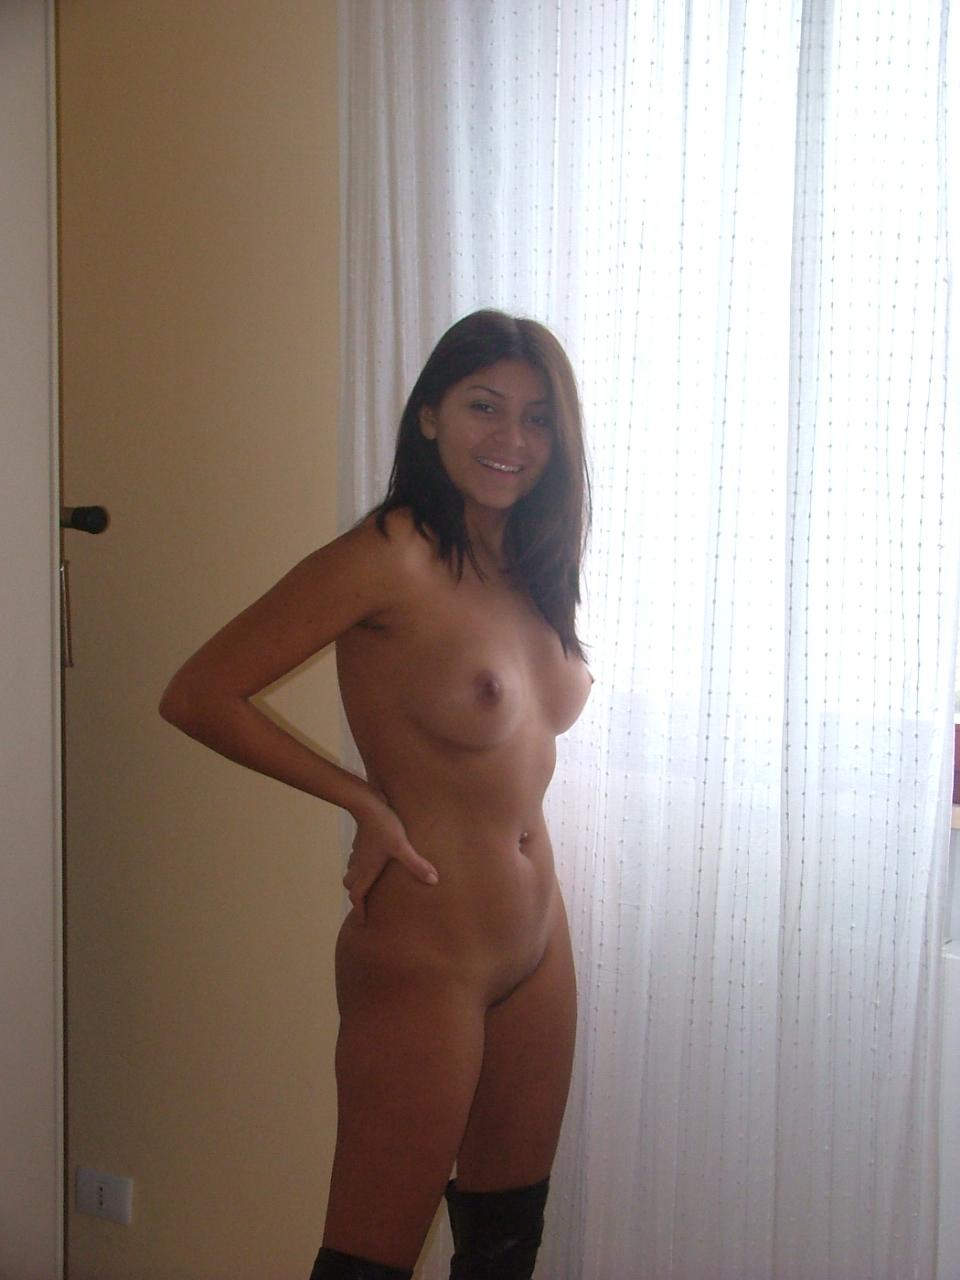 Big butt porn thumbs